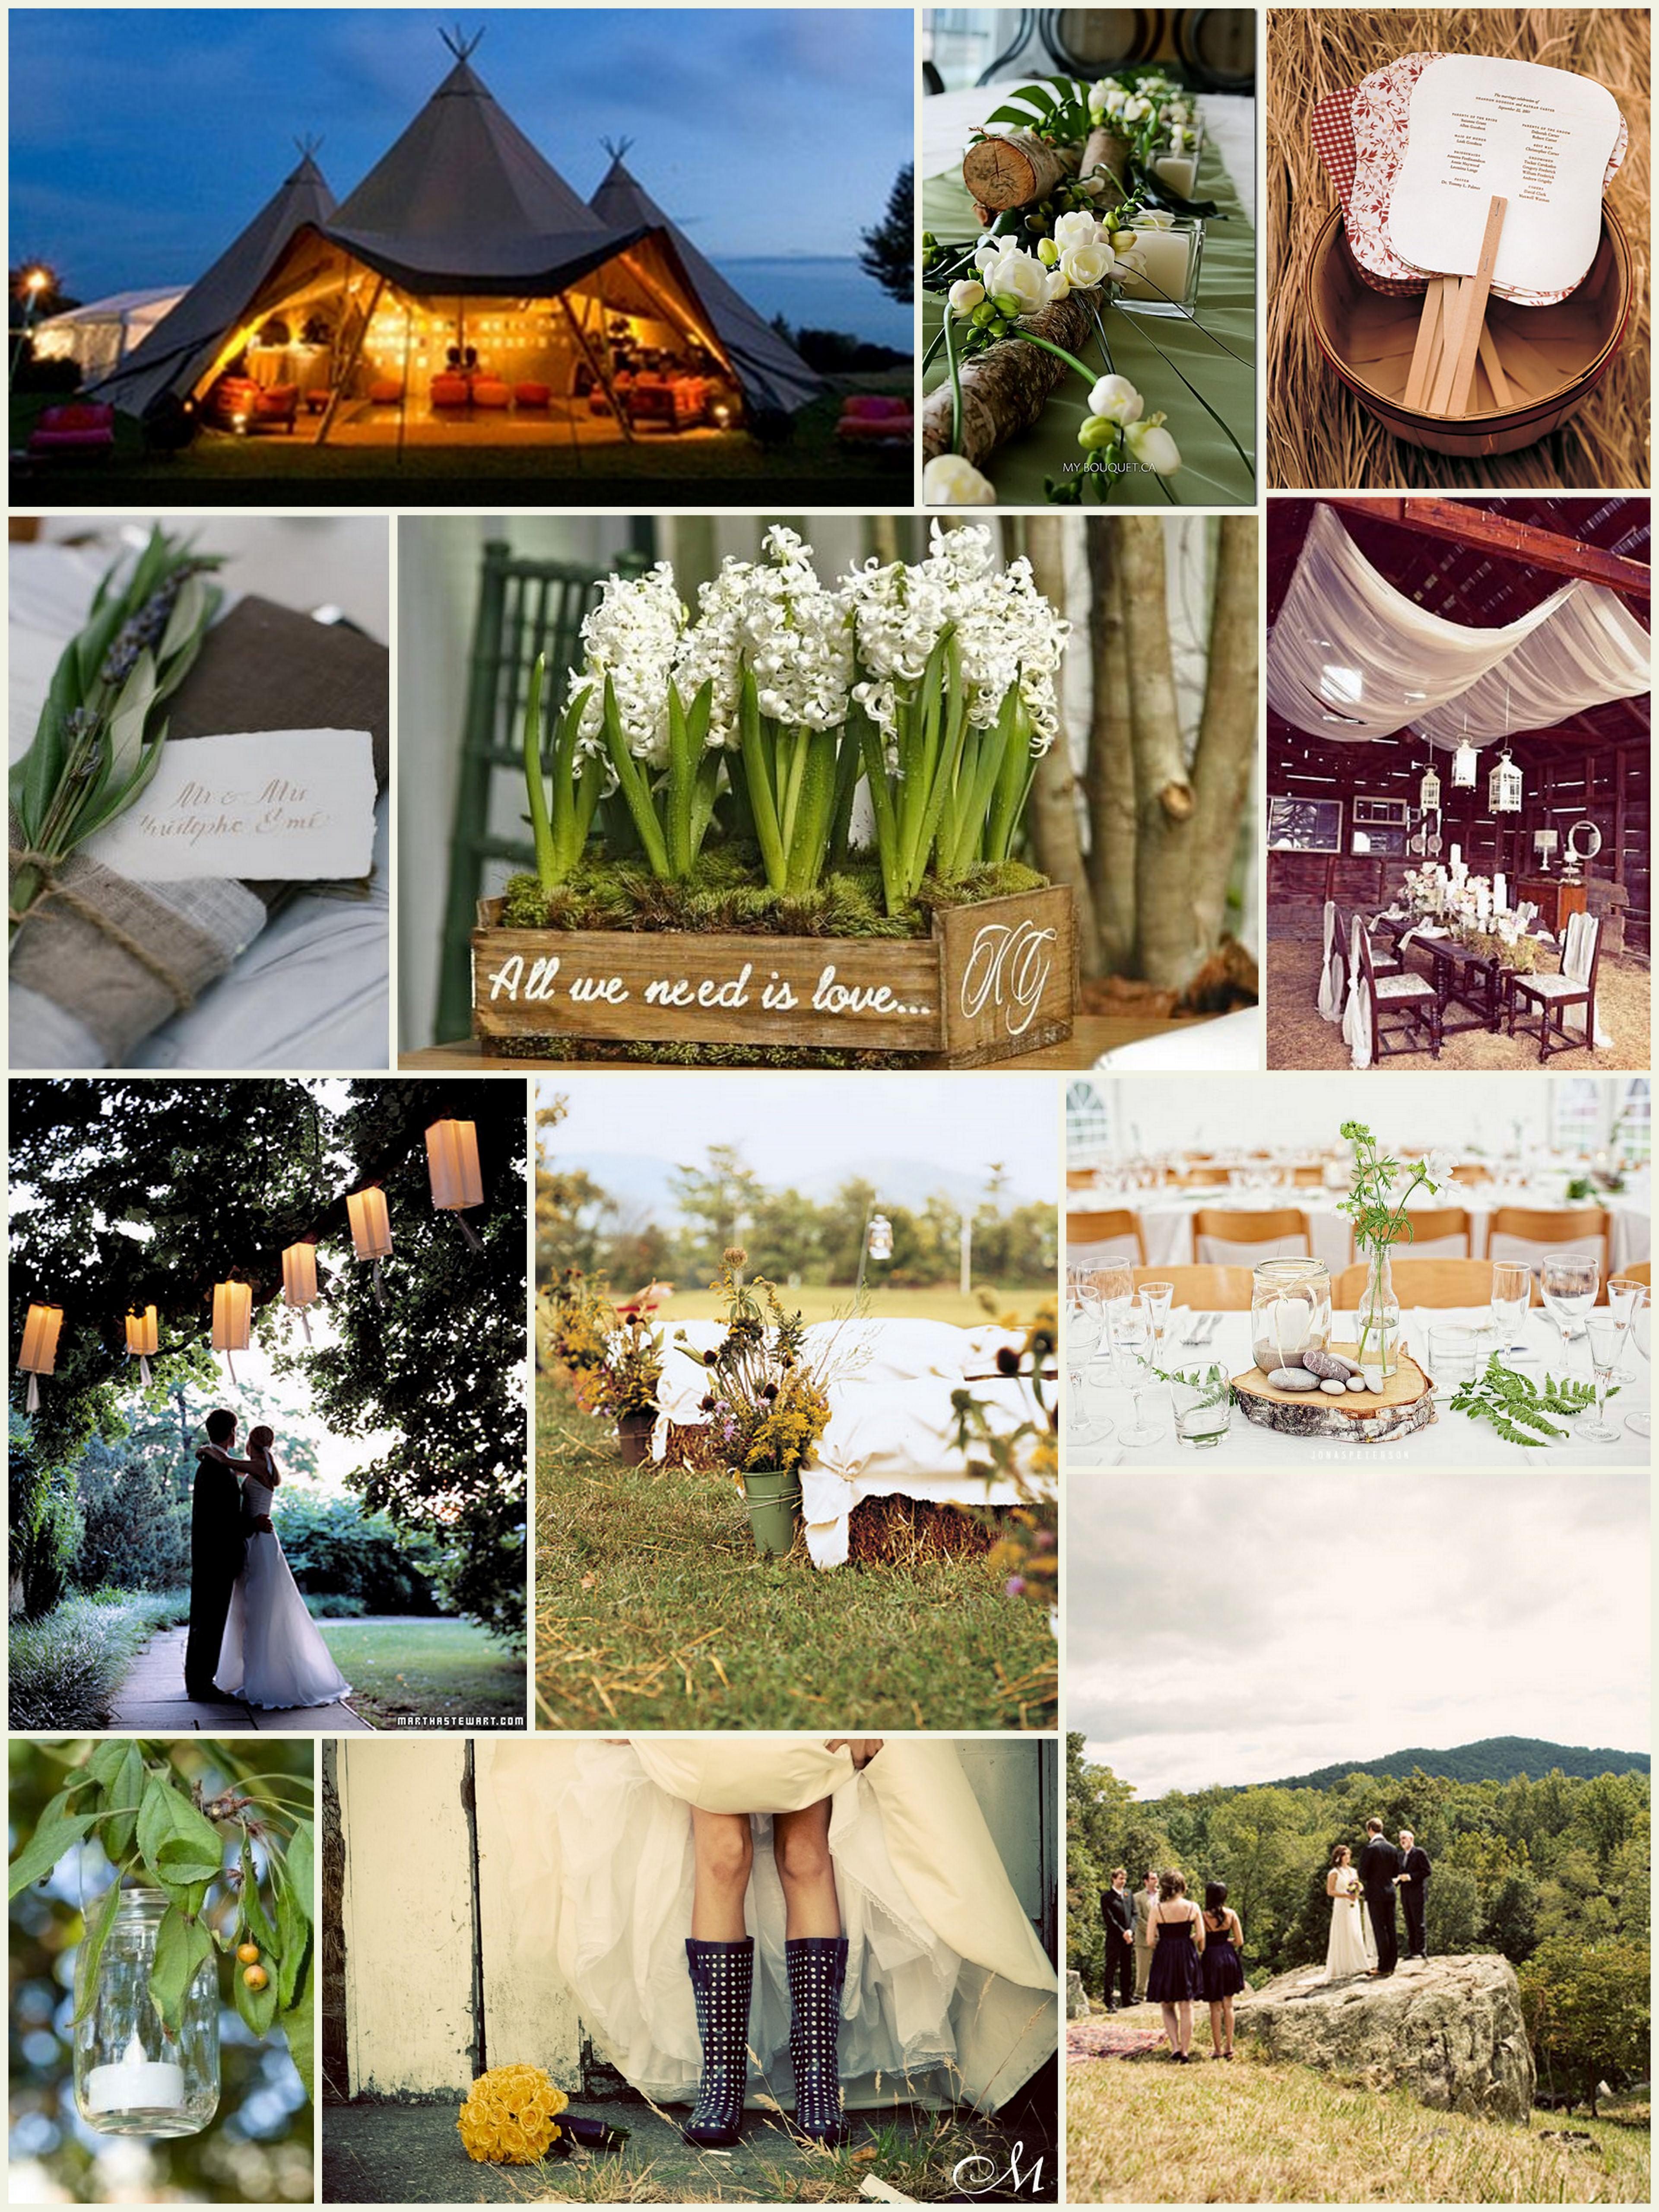 Outdoor wedding inspiration board boho weddings for the for Outdoor wedding themes